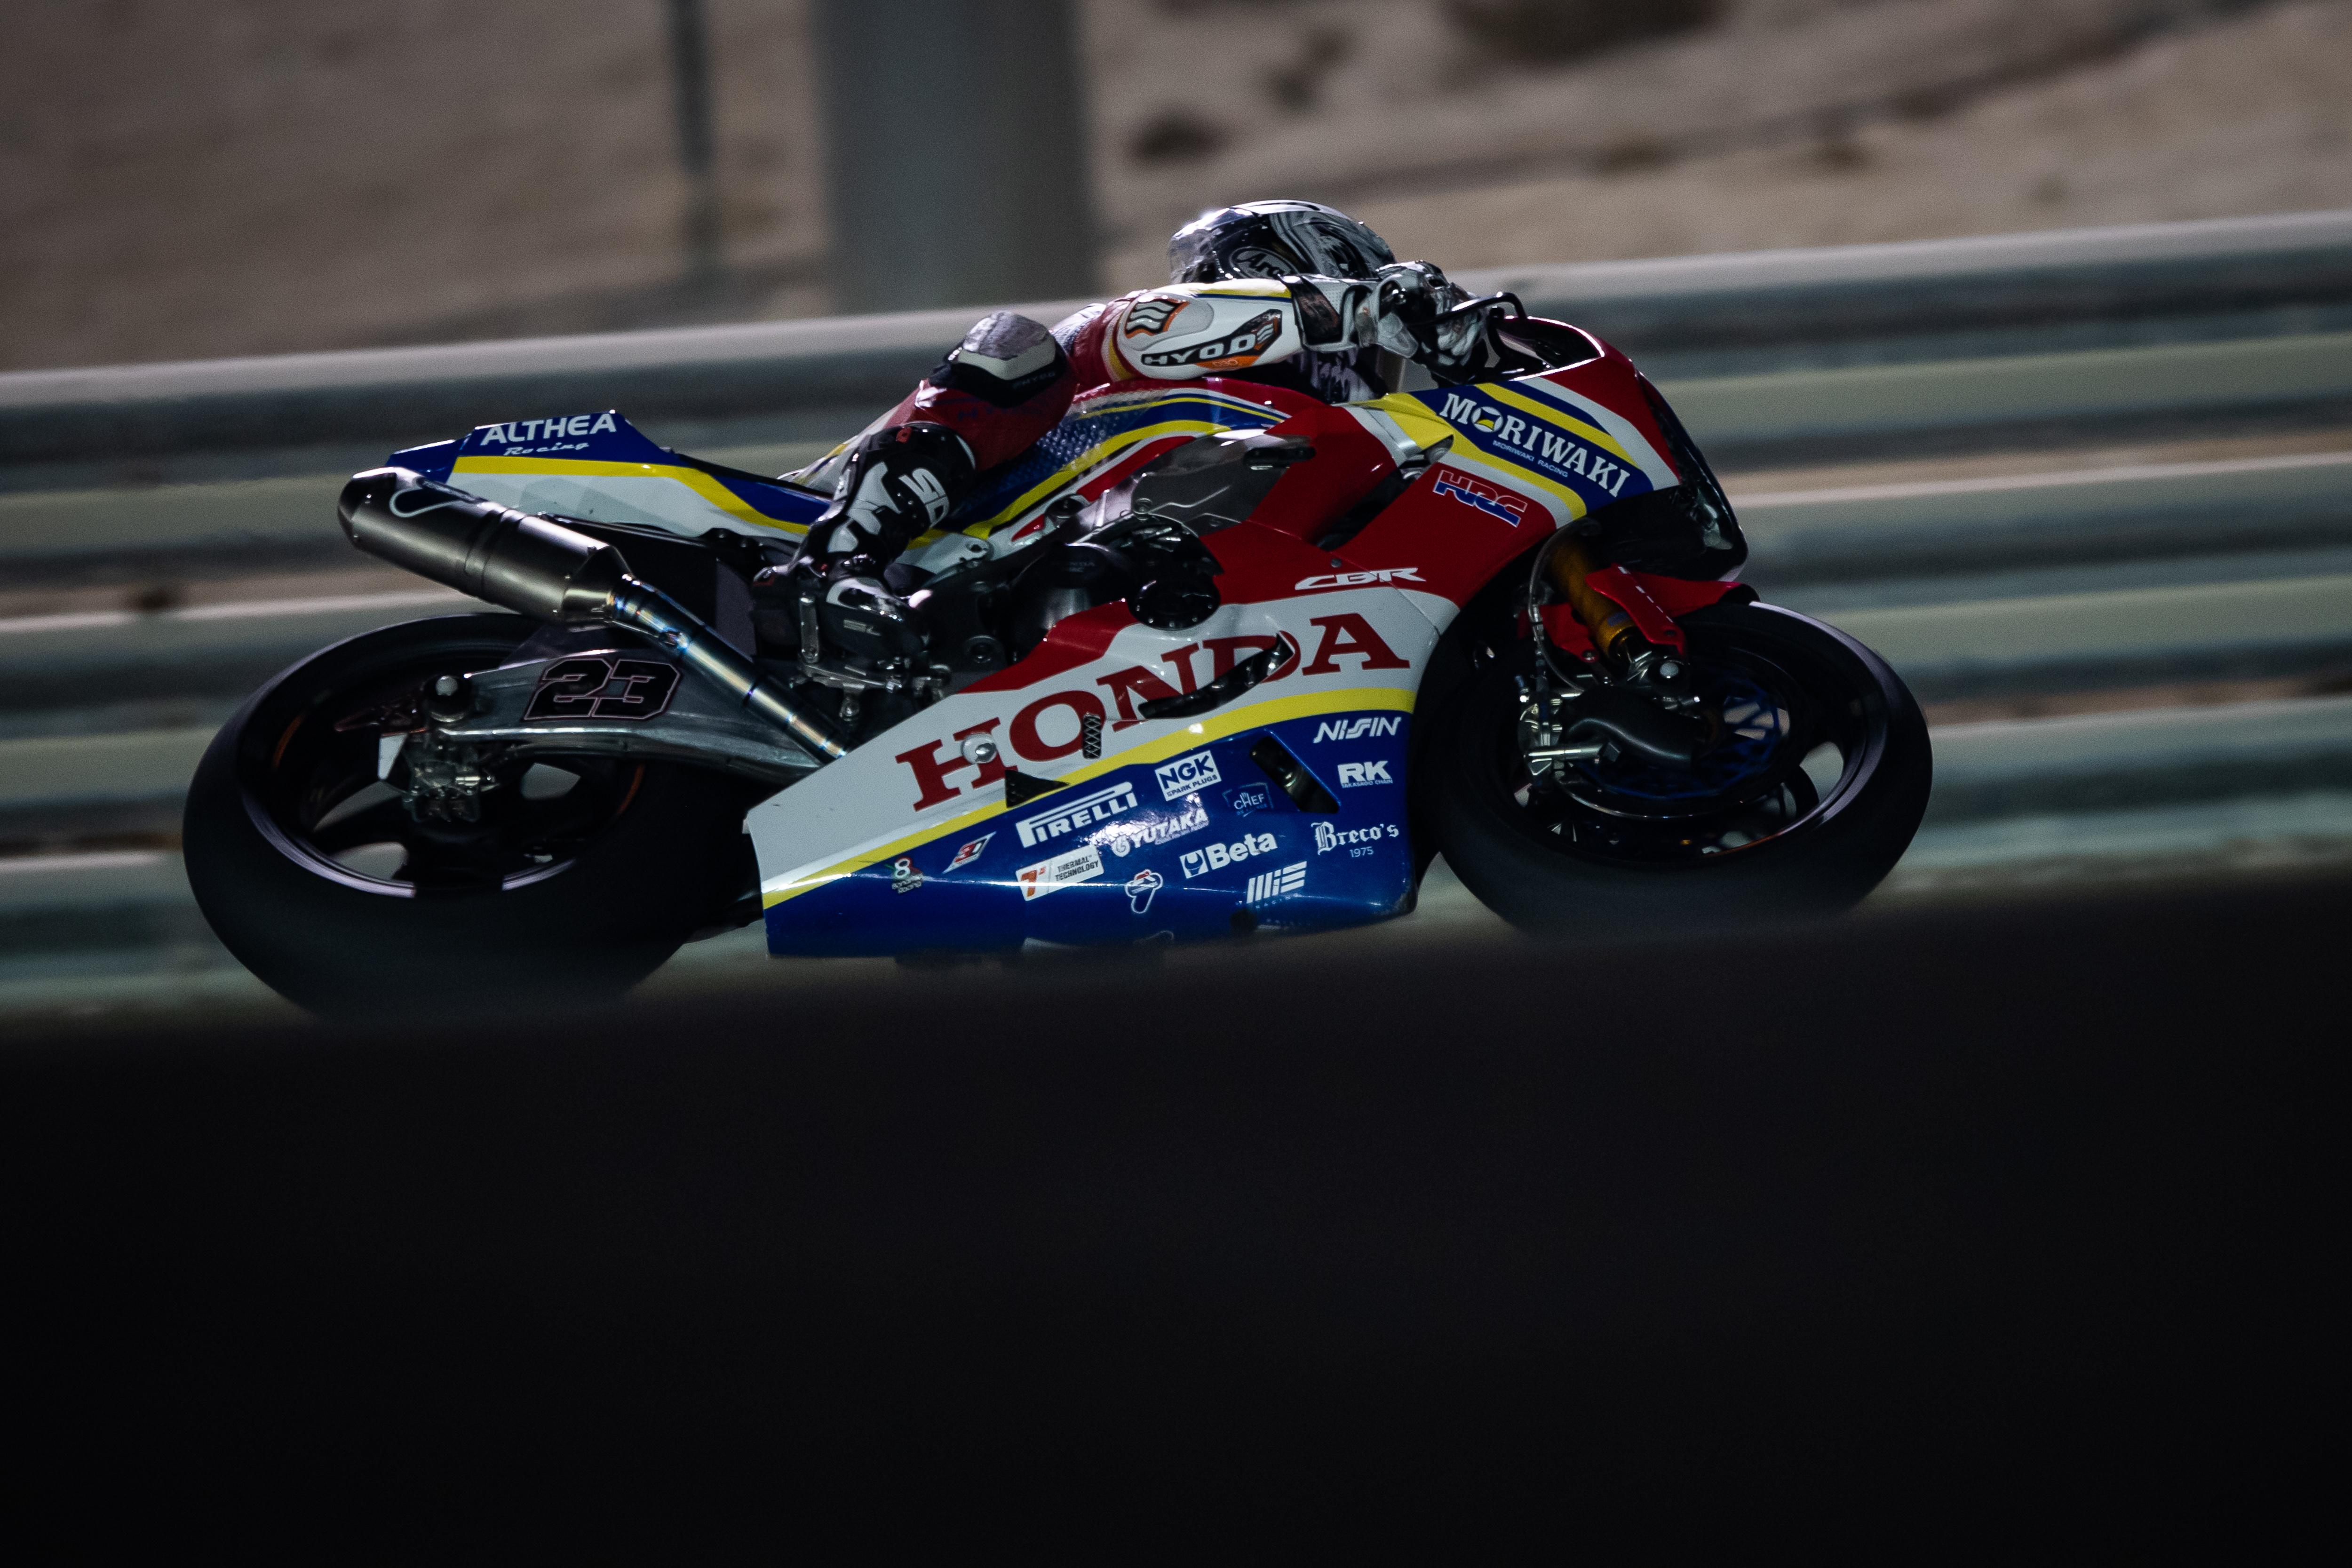 Moriwaki_Althea_Honda_Team_Qatar_44